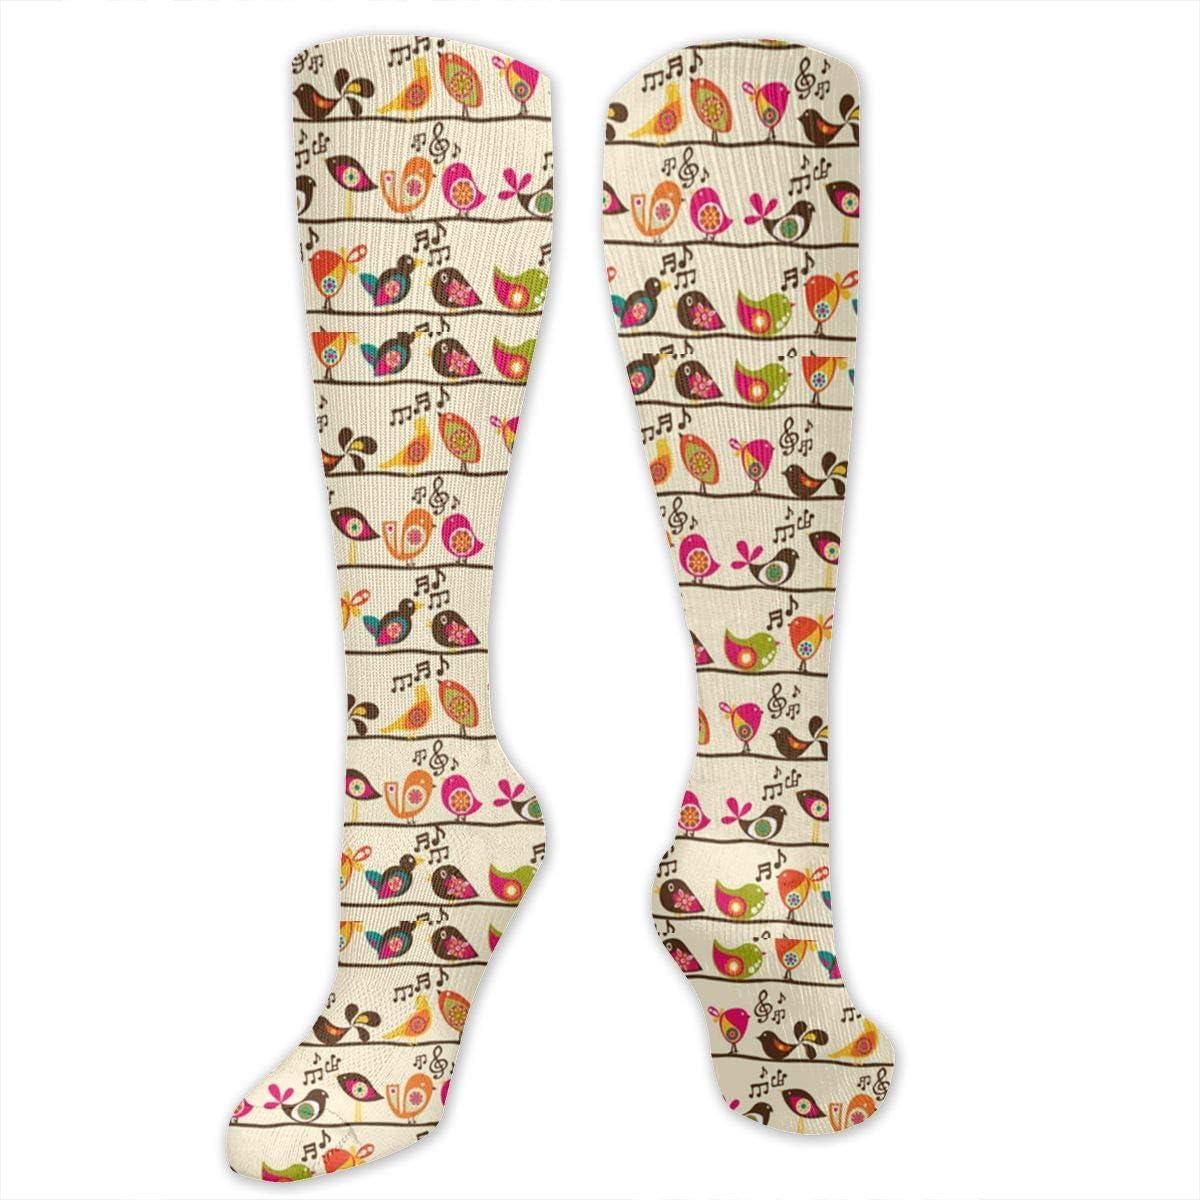 Chanwazibibiliu Singing Birds Mens Colorful Dress Socks Funky Men Multicolored Pattern Fashionable Fun Crew Cotton Socks